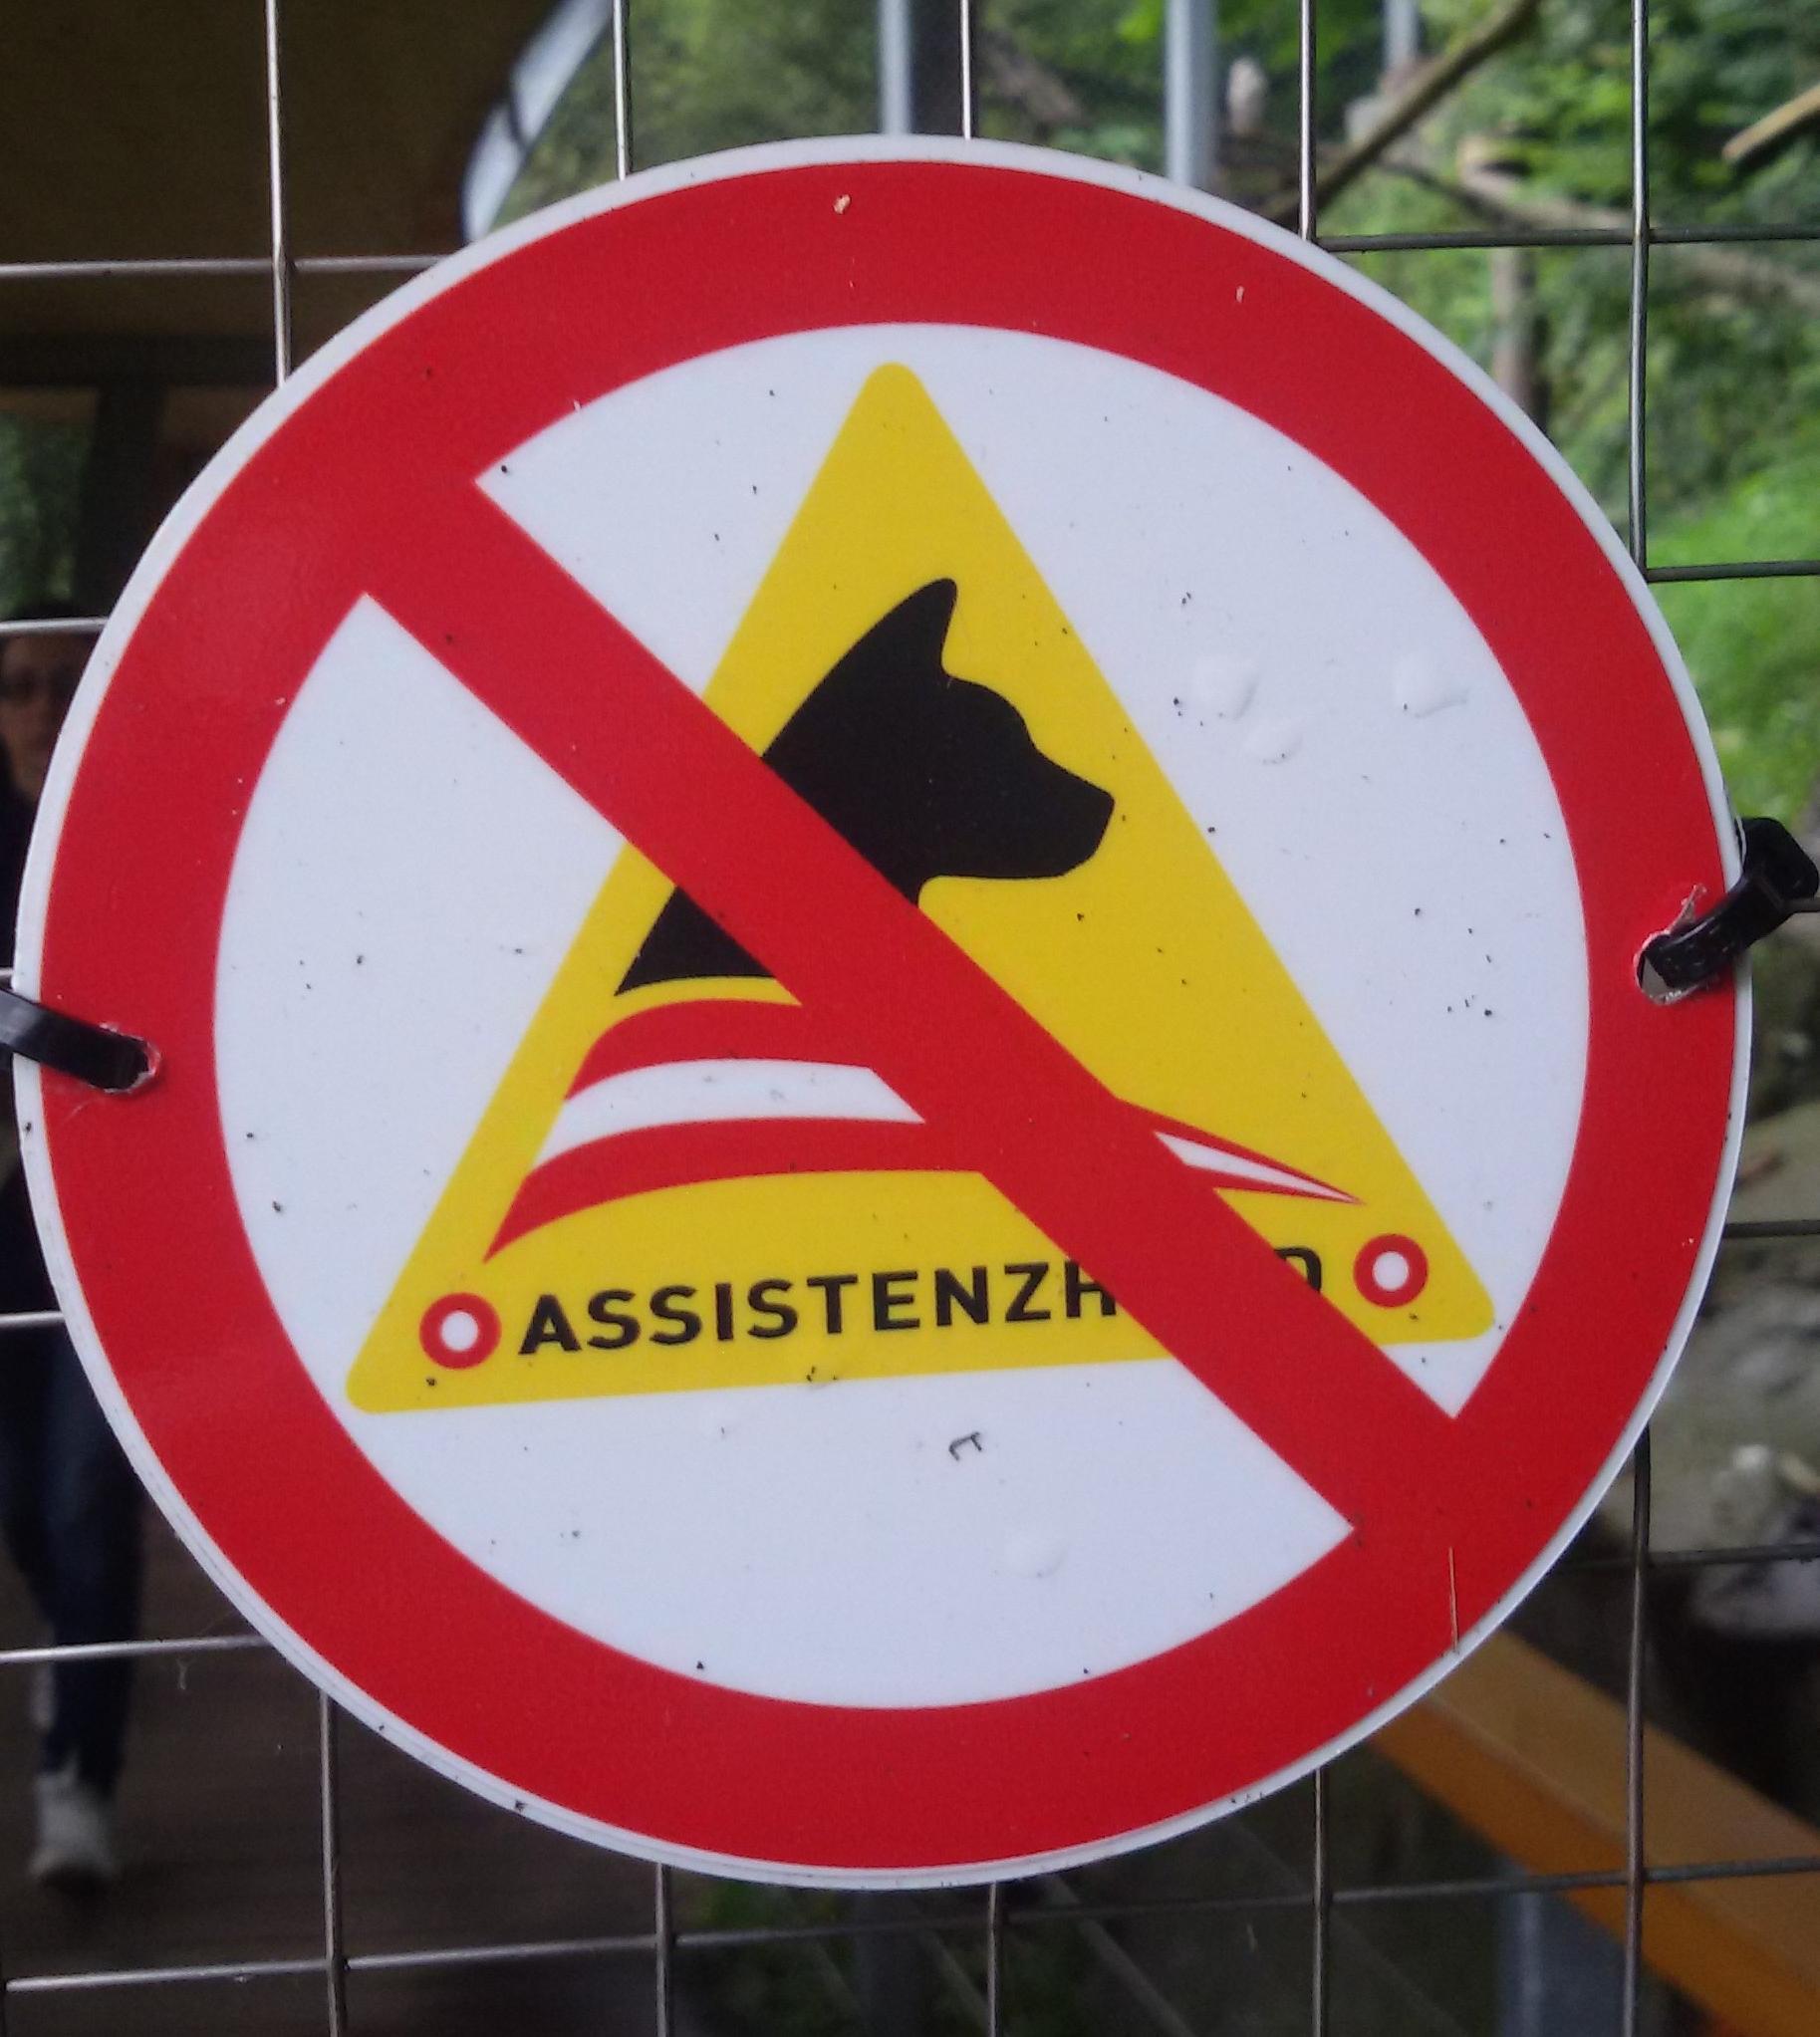 Assistenzhunde verboten, Zoo